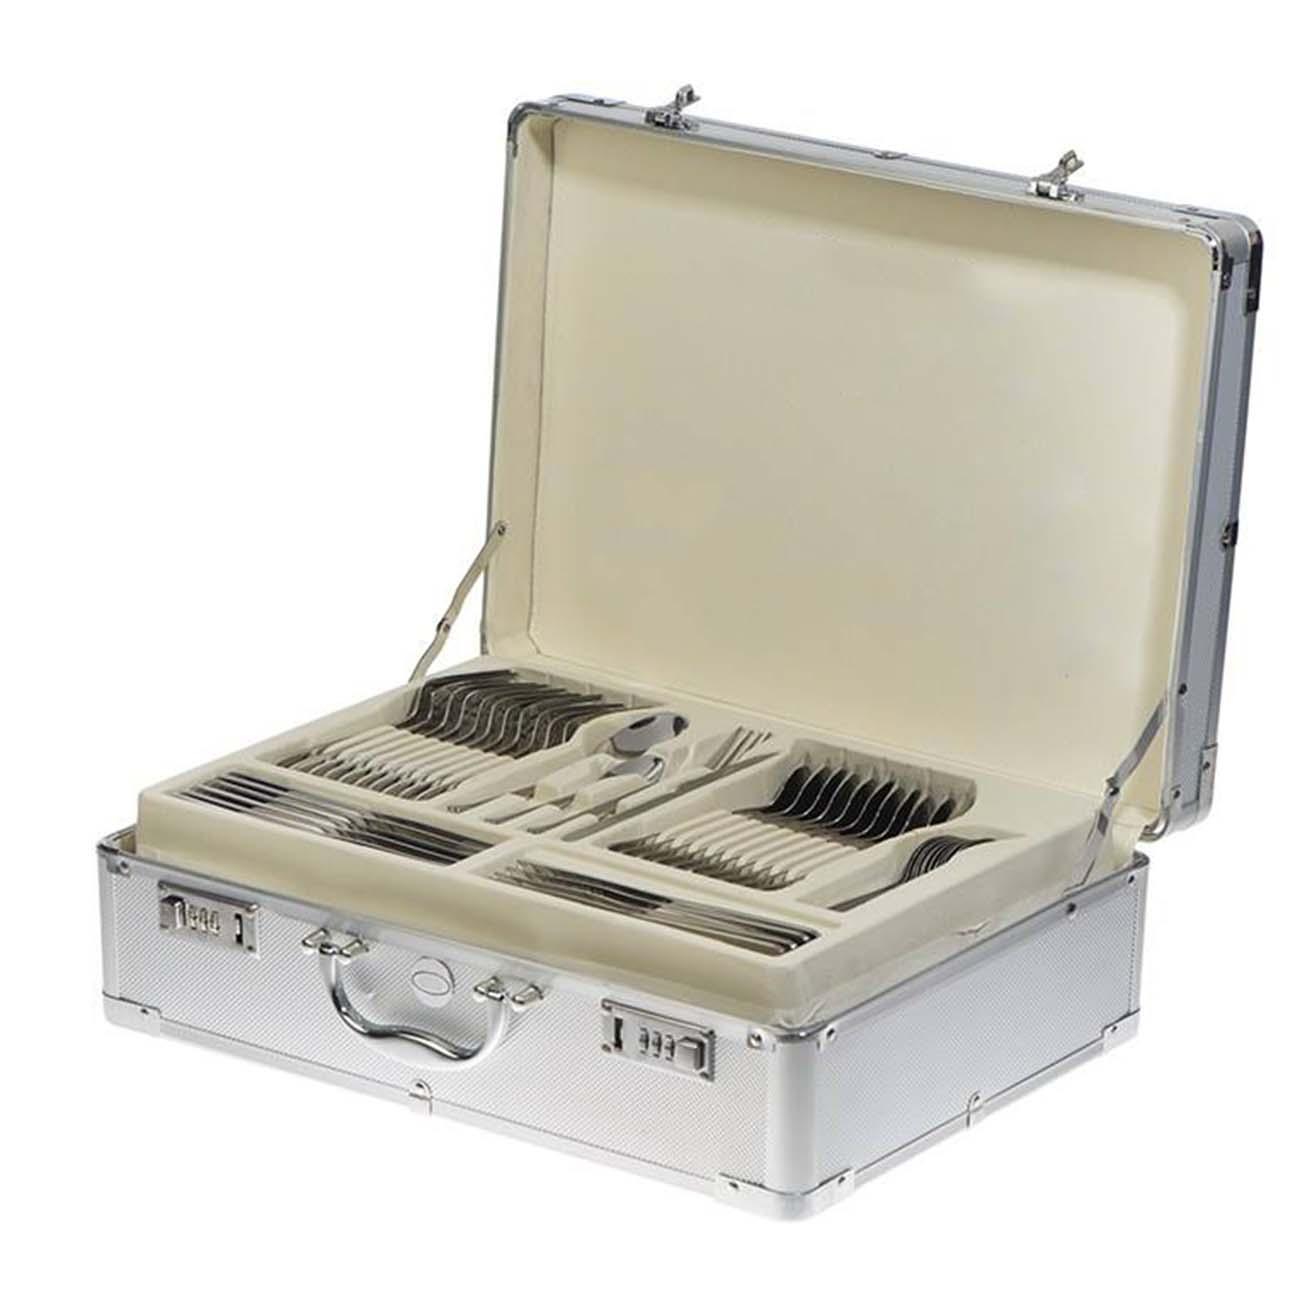 سرویس قاشق چنگال 134 پارچه ام جی اس مدل st92